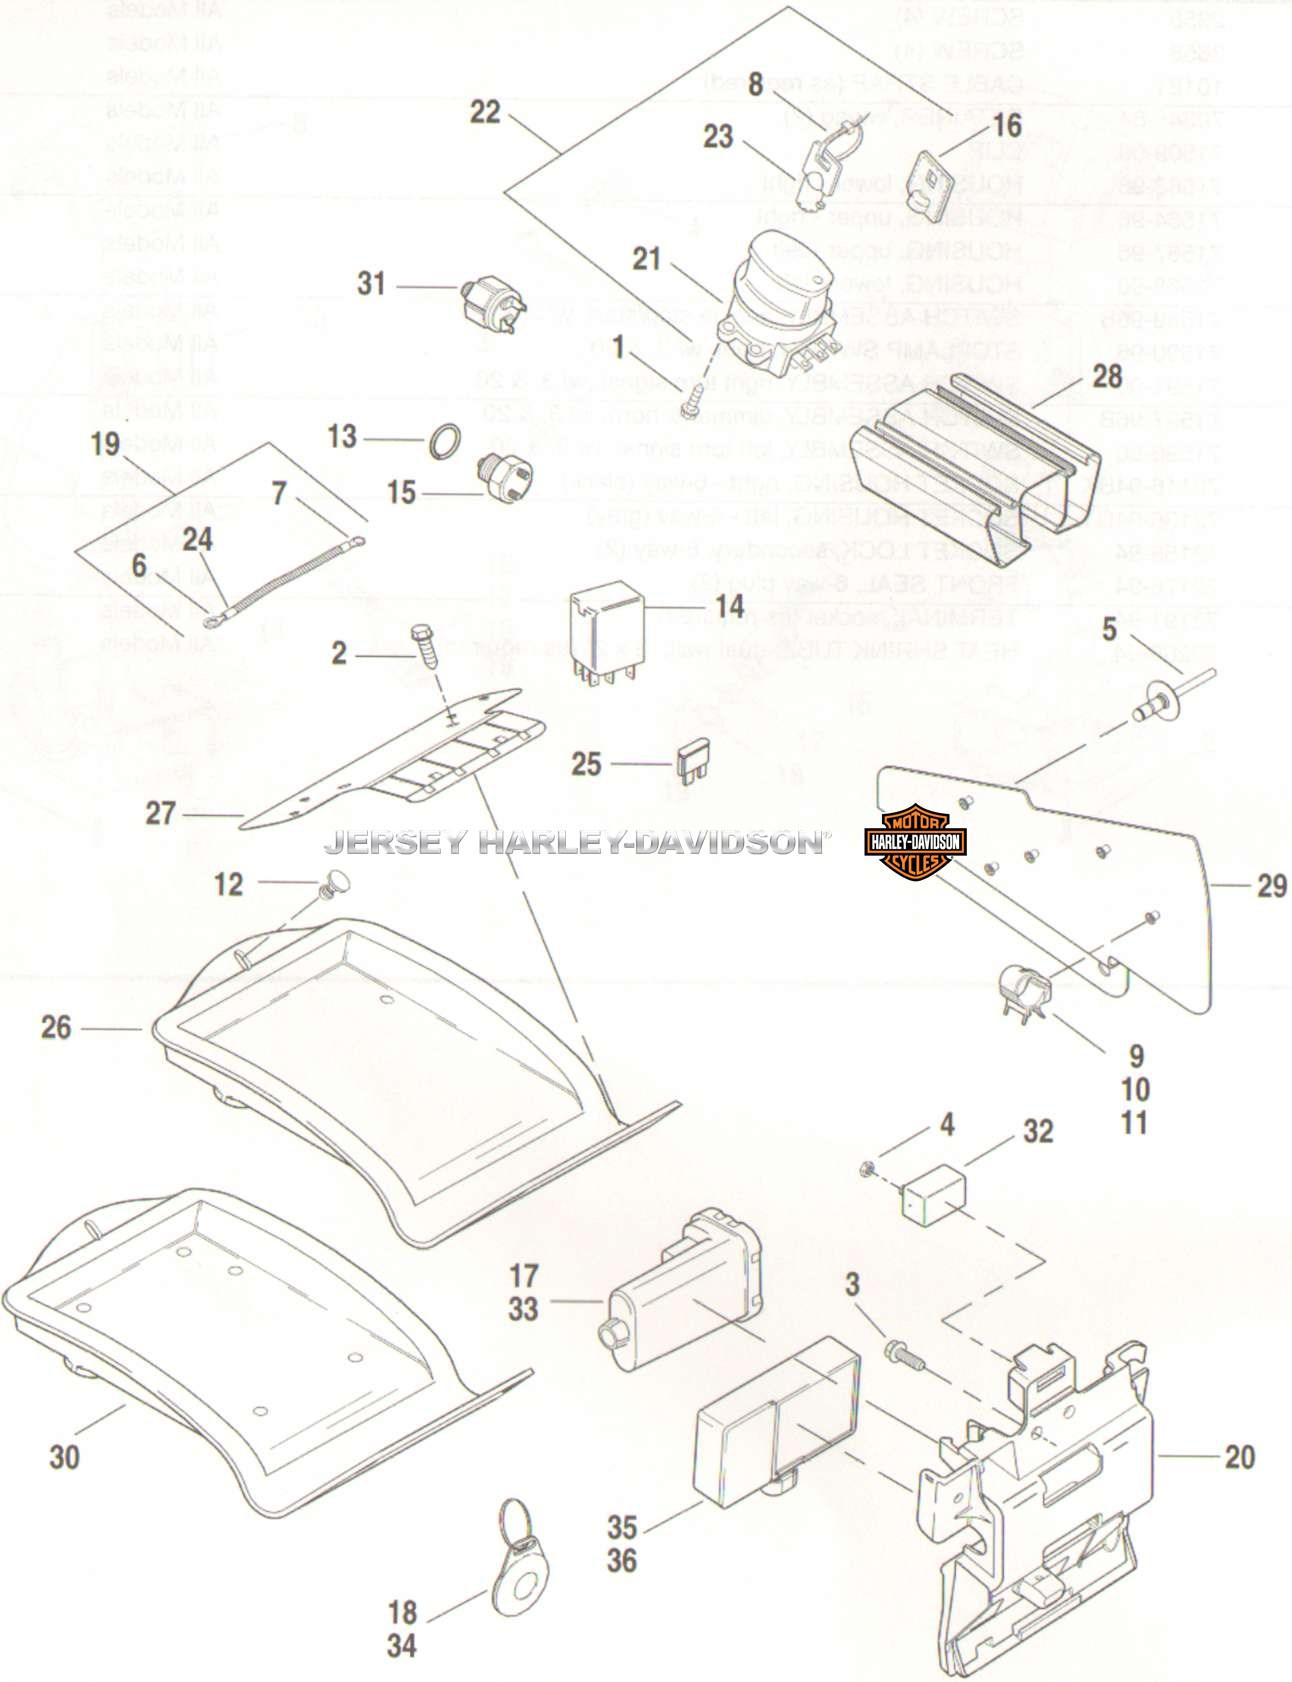 Kz550 Wiring Diagram. Diagram. Auto Wiring Diagram